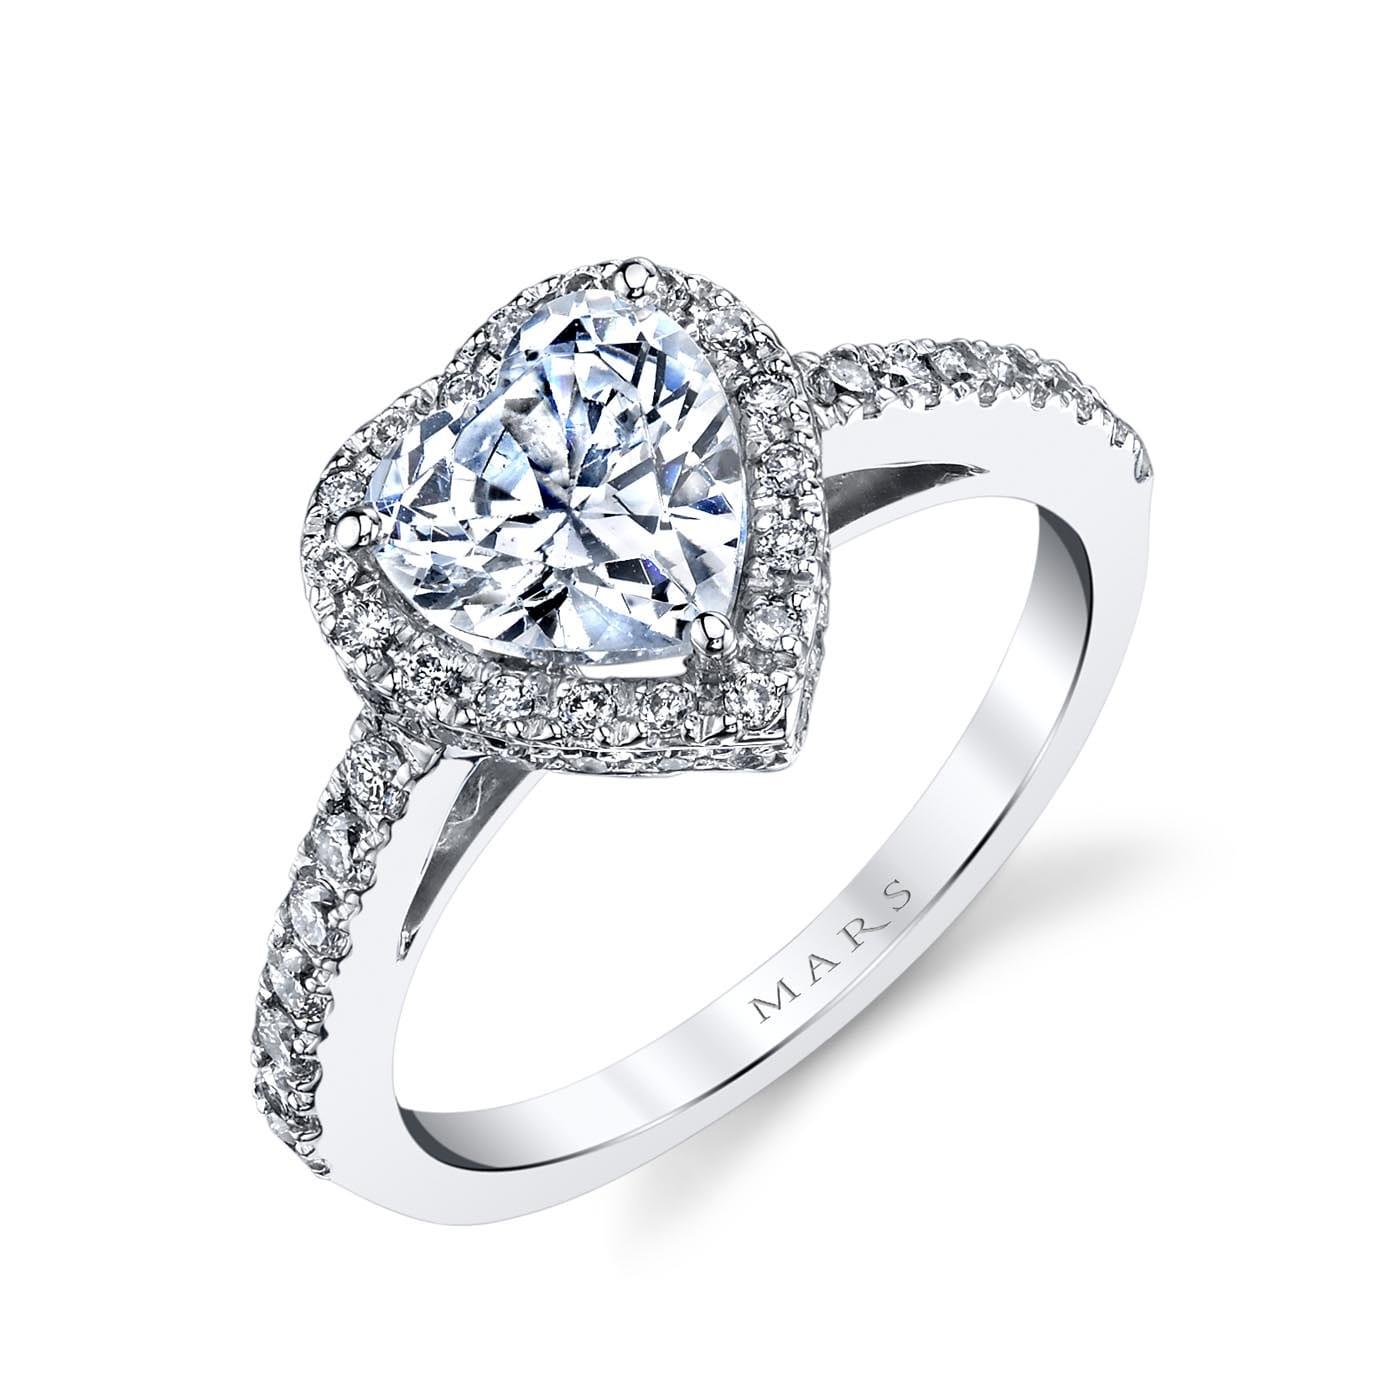 Halo Engagement RingStyle #: MARS 13759